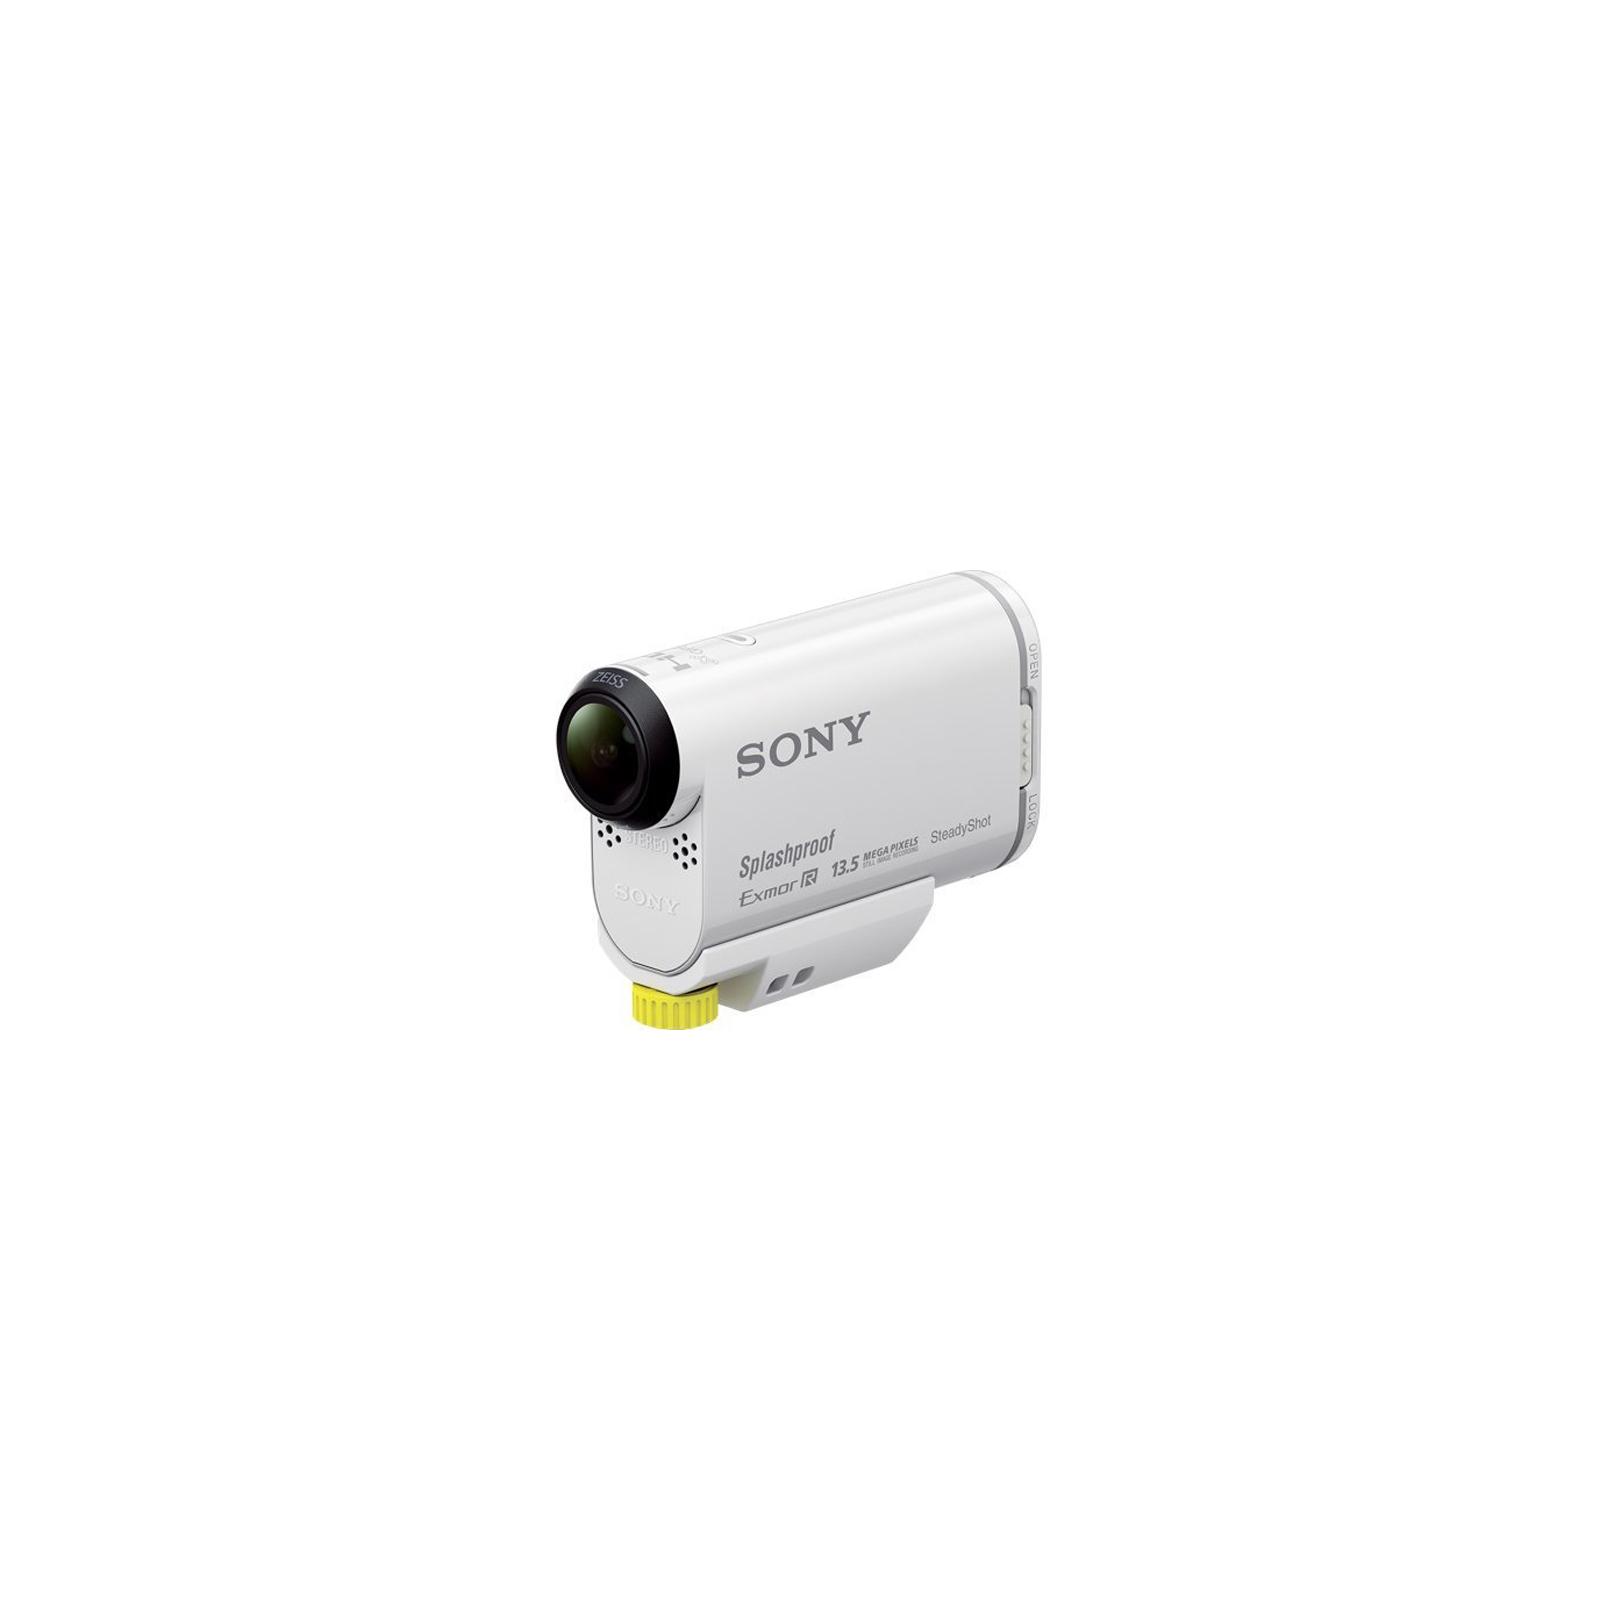 Экшн-камера SONY HDR-AS100V w/bicycle mount (HDRAS100VB.CEN) изображение 3